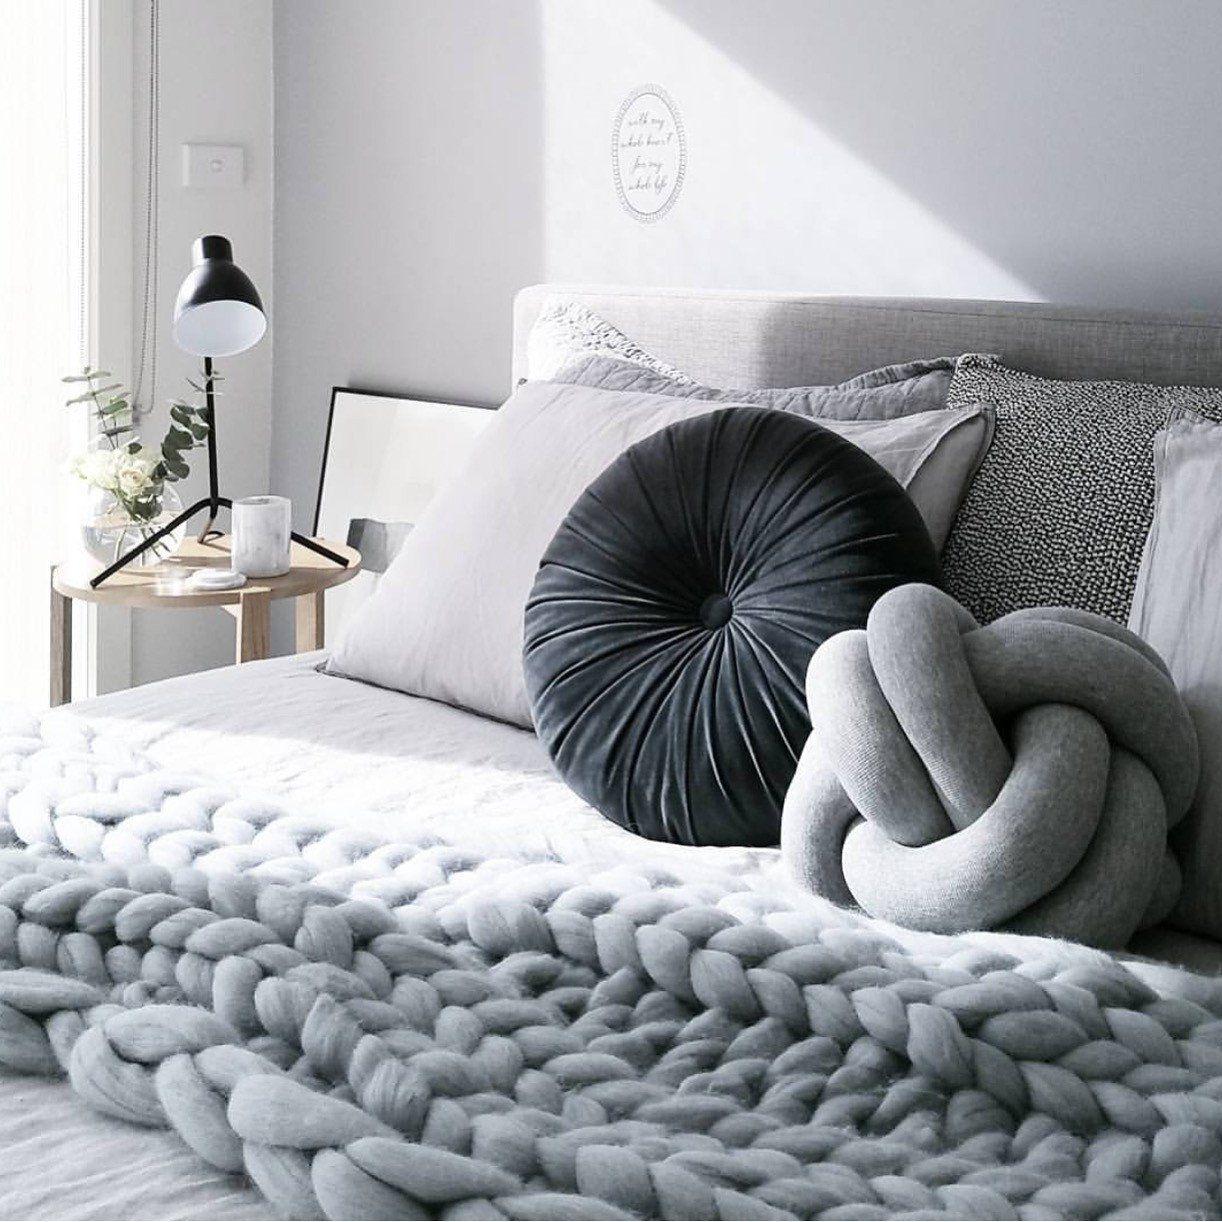 подарки подушка дома подушки для идеи своими сделай сам узел рукамидекор